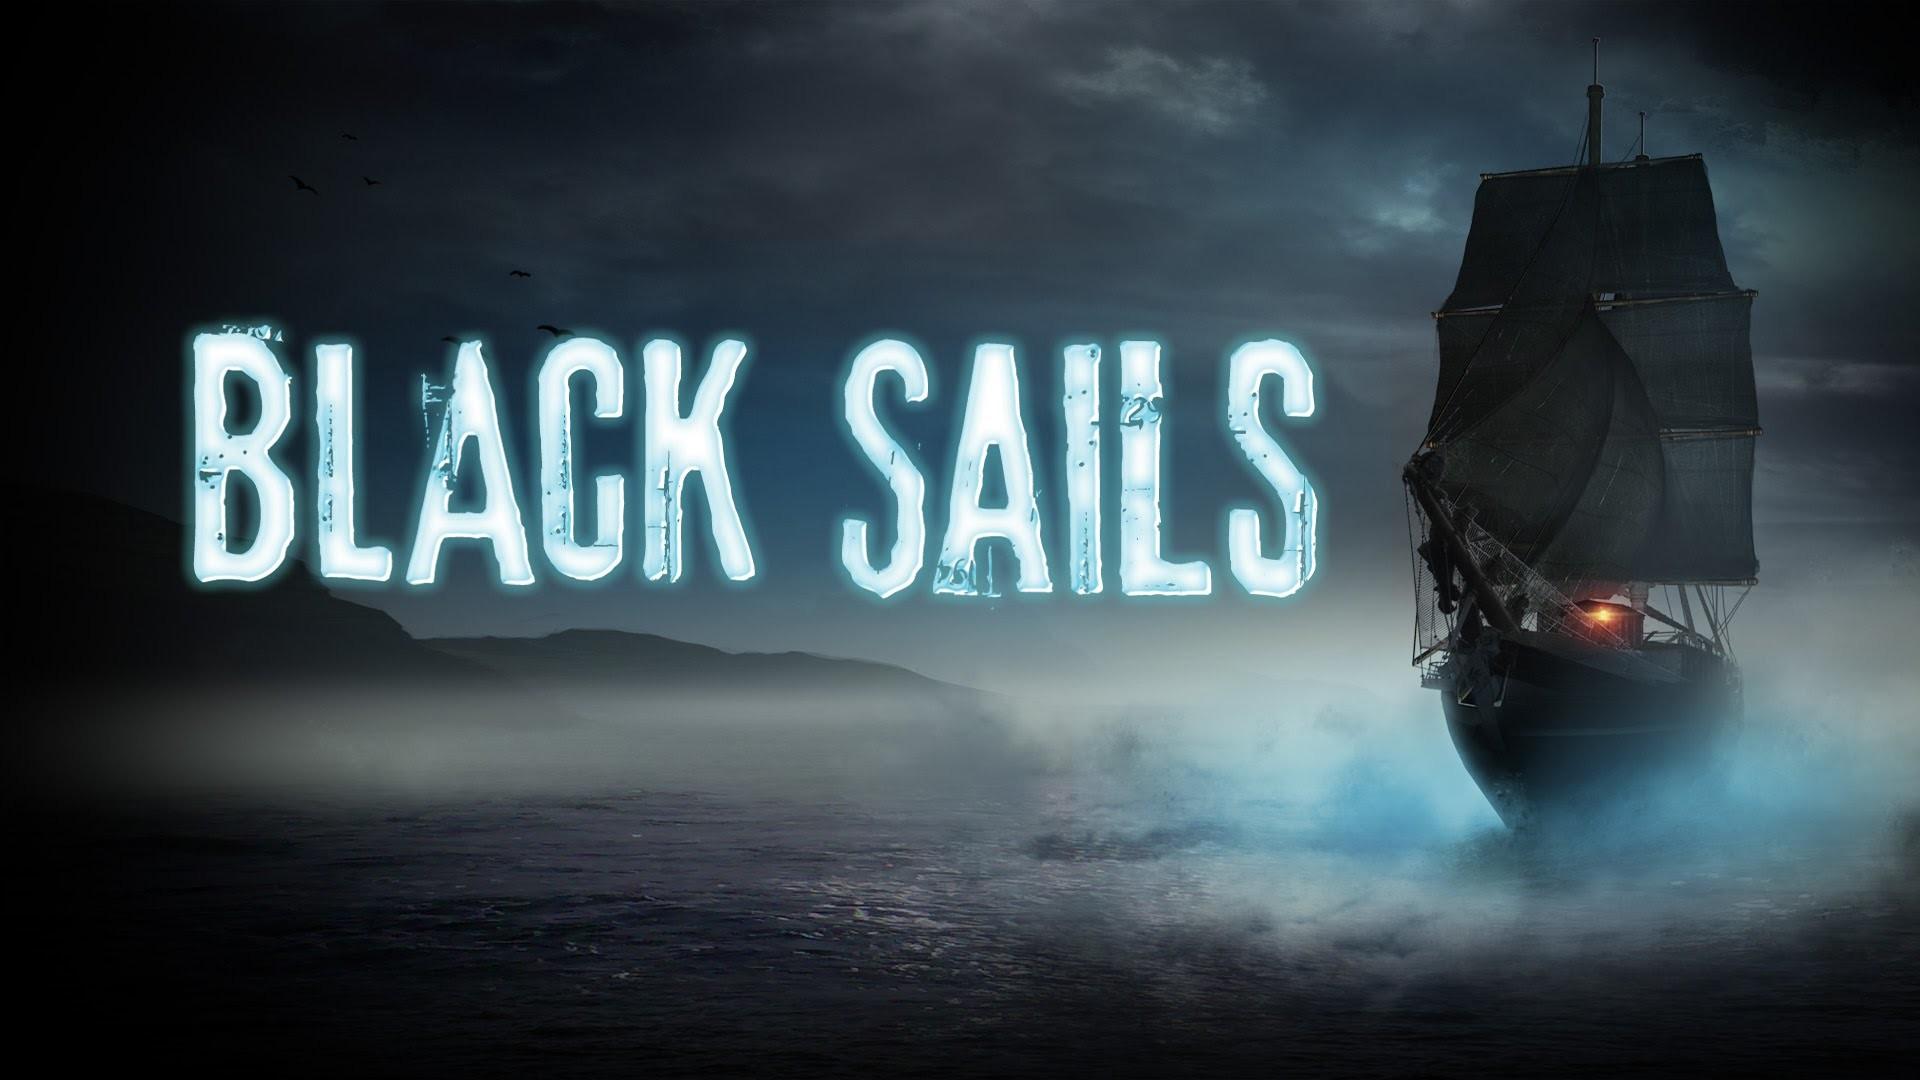 1920x1080 black sails playthrough dhalloween fr hd ep 1